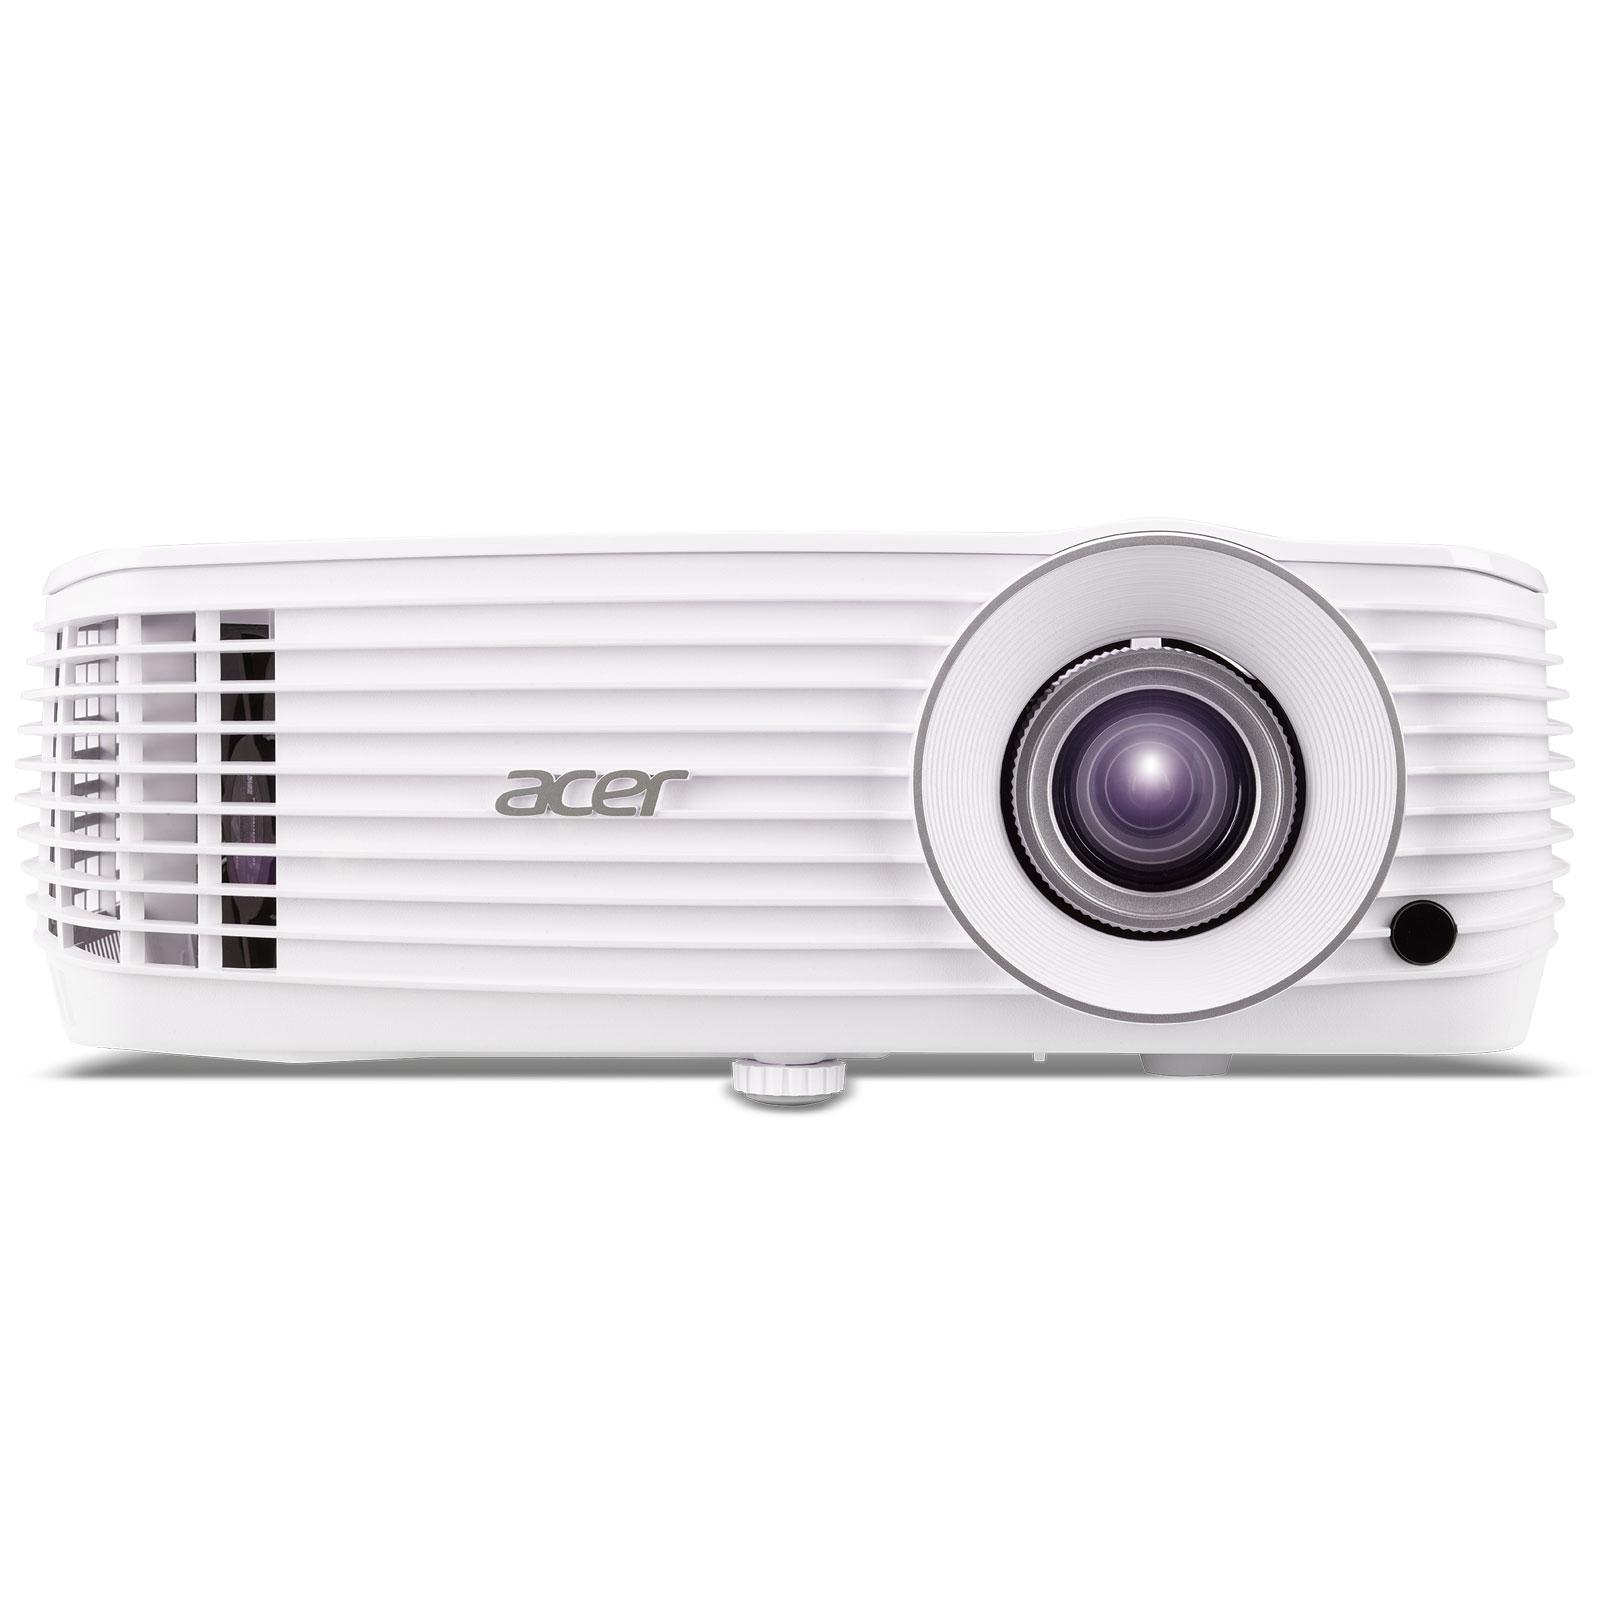 Acer V6810 Videoprojecteur Acer Sur Ldlc Com